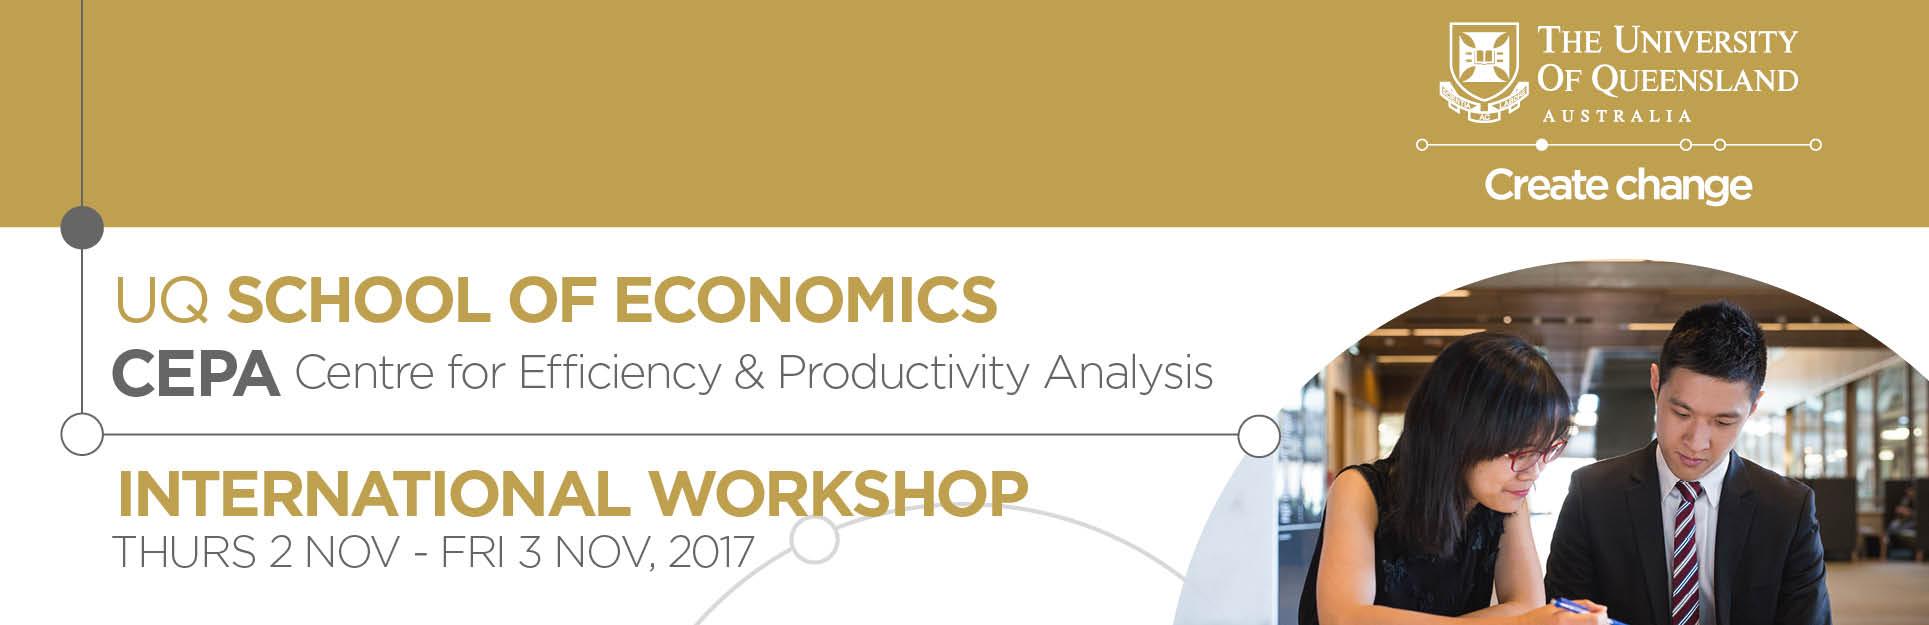 International Workshop on Performance Analysis CEPA 2017